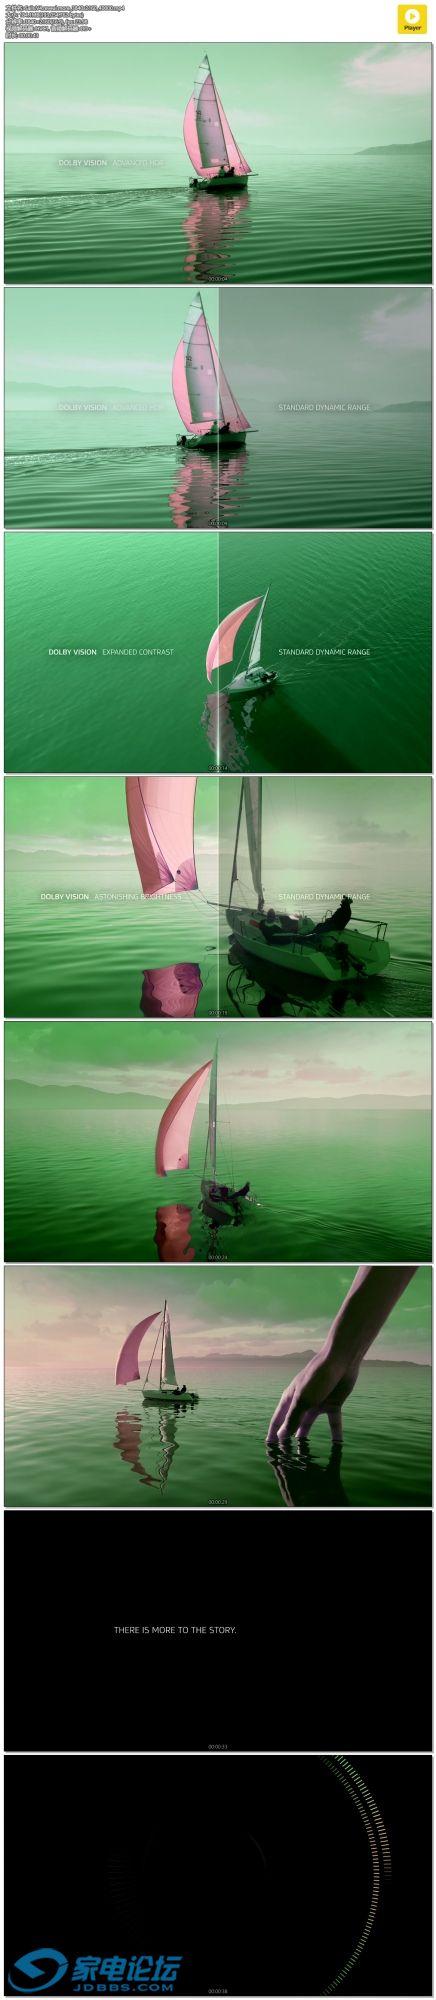 Sails.V4.reveal.more_3840x2160_40000.mp4.jpg